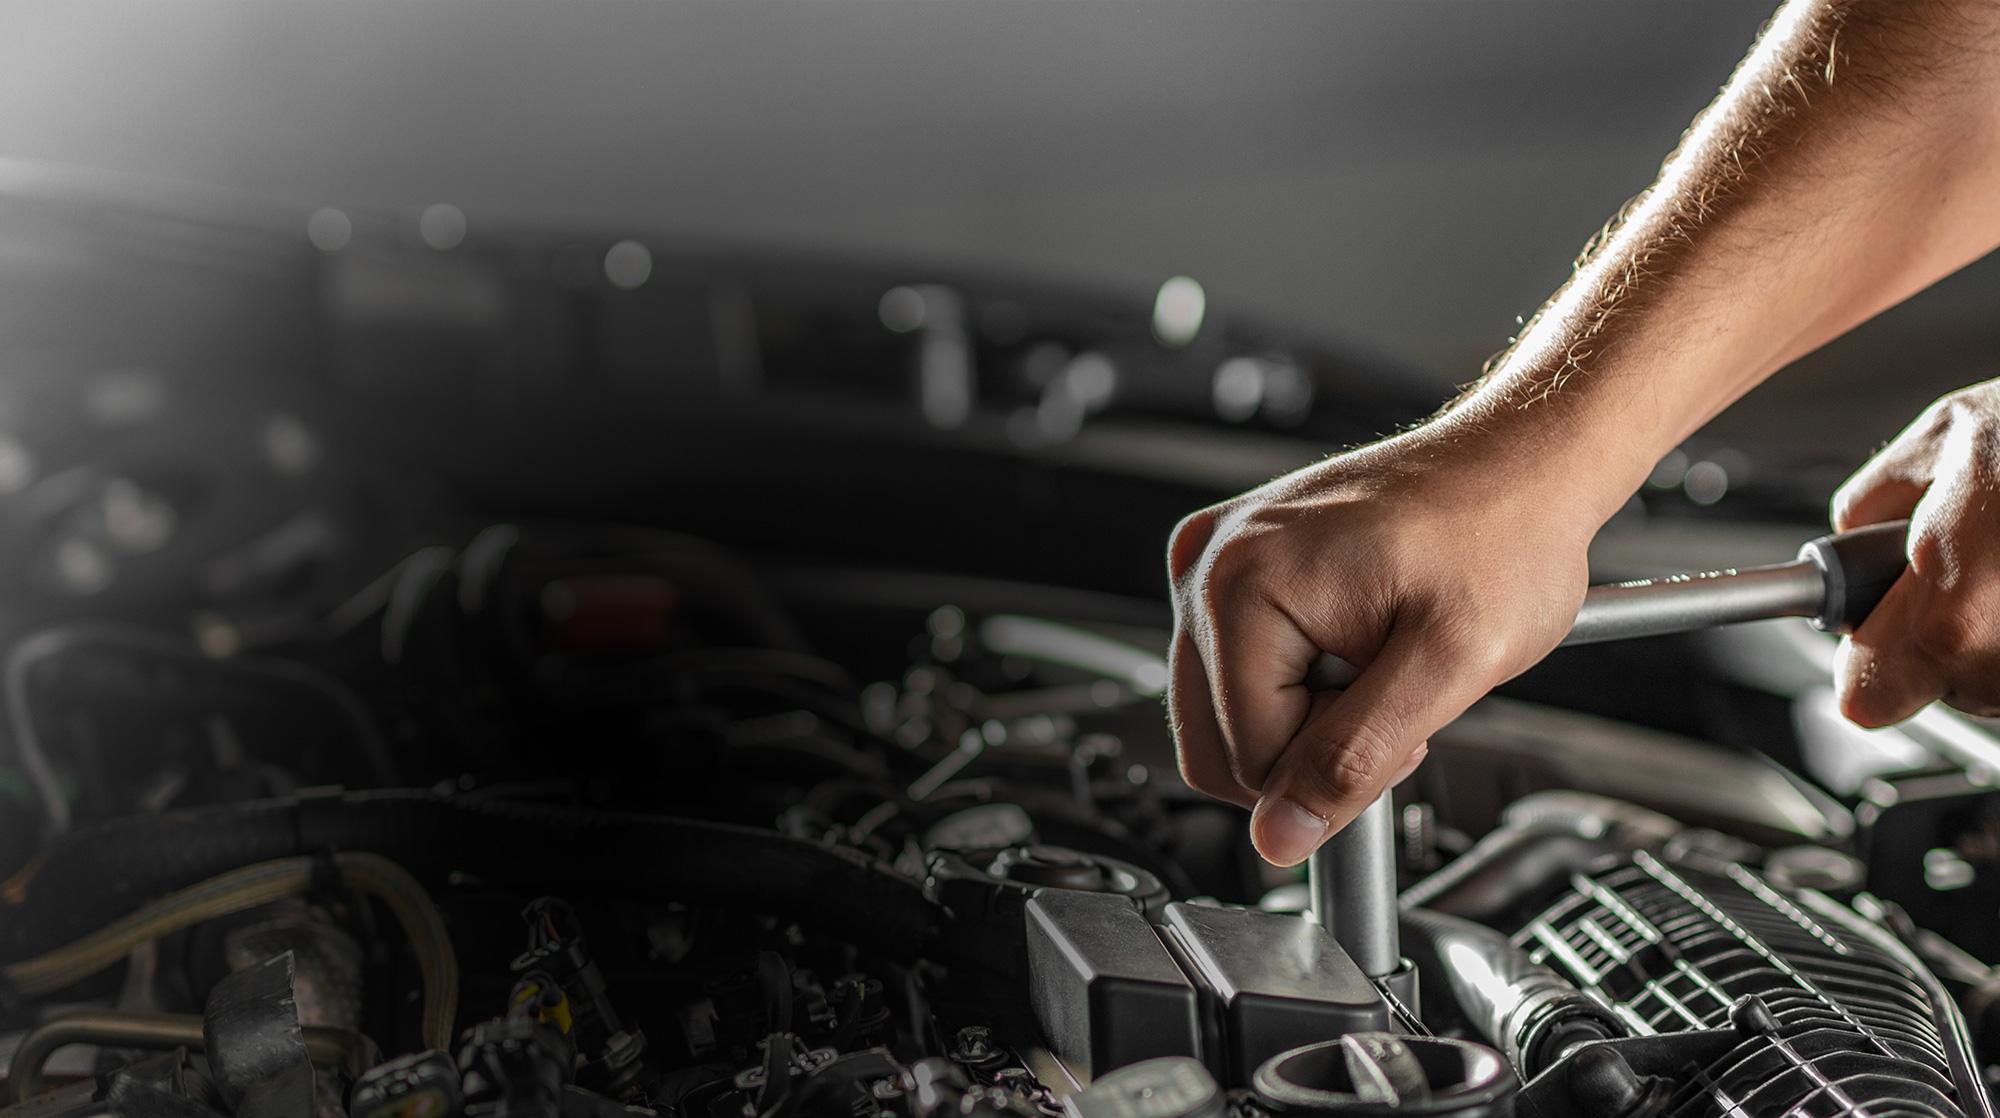 A.C.E. Mobile Mechanic Perth